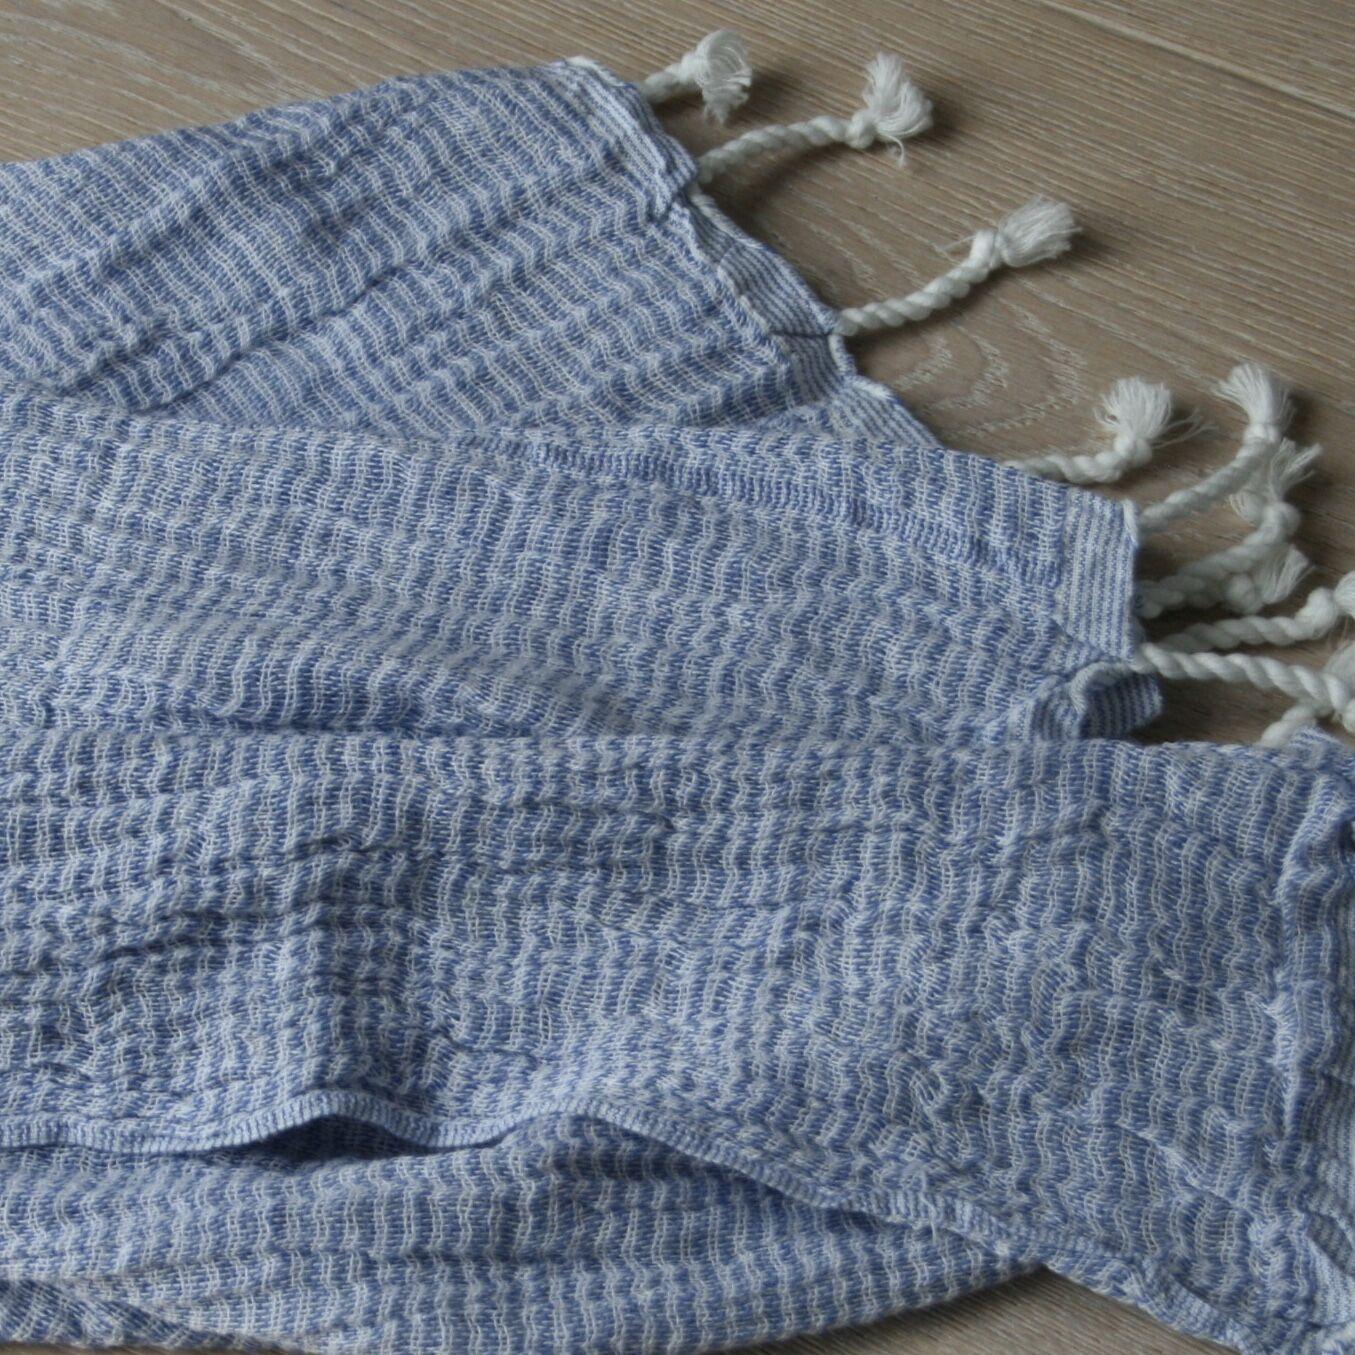 Ateljé Stockholm. Krinklad blå handduk ekologisk bomull.